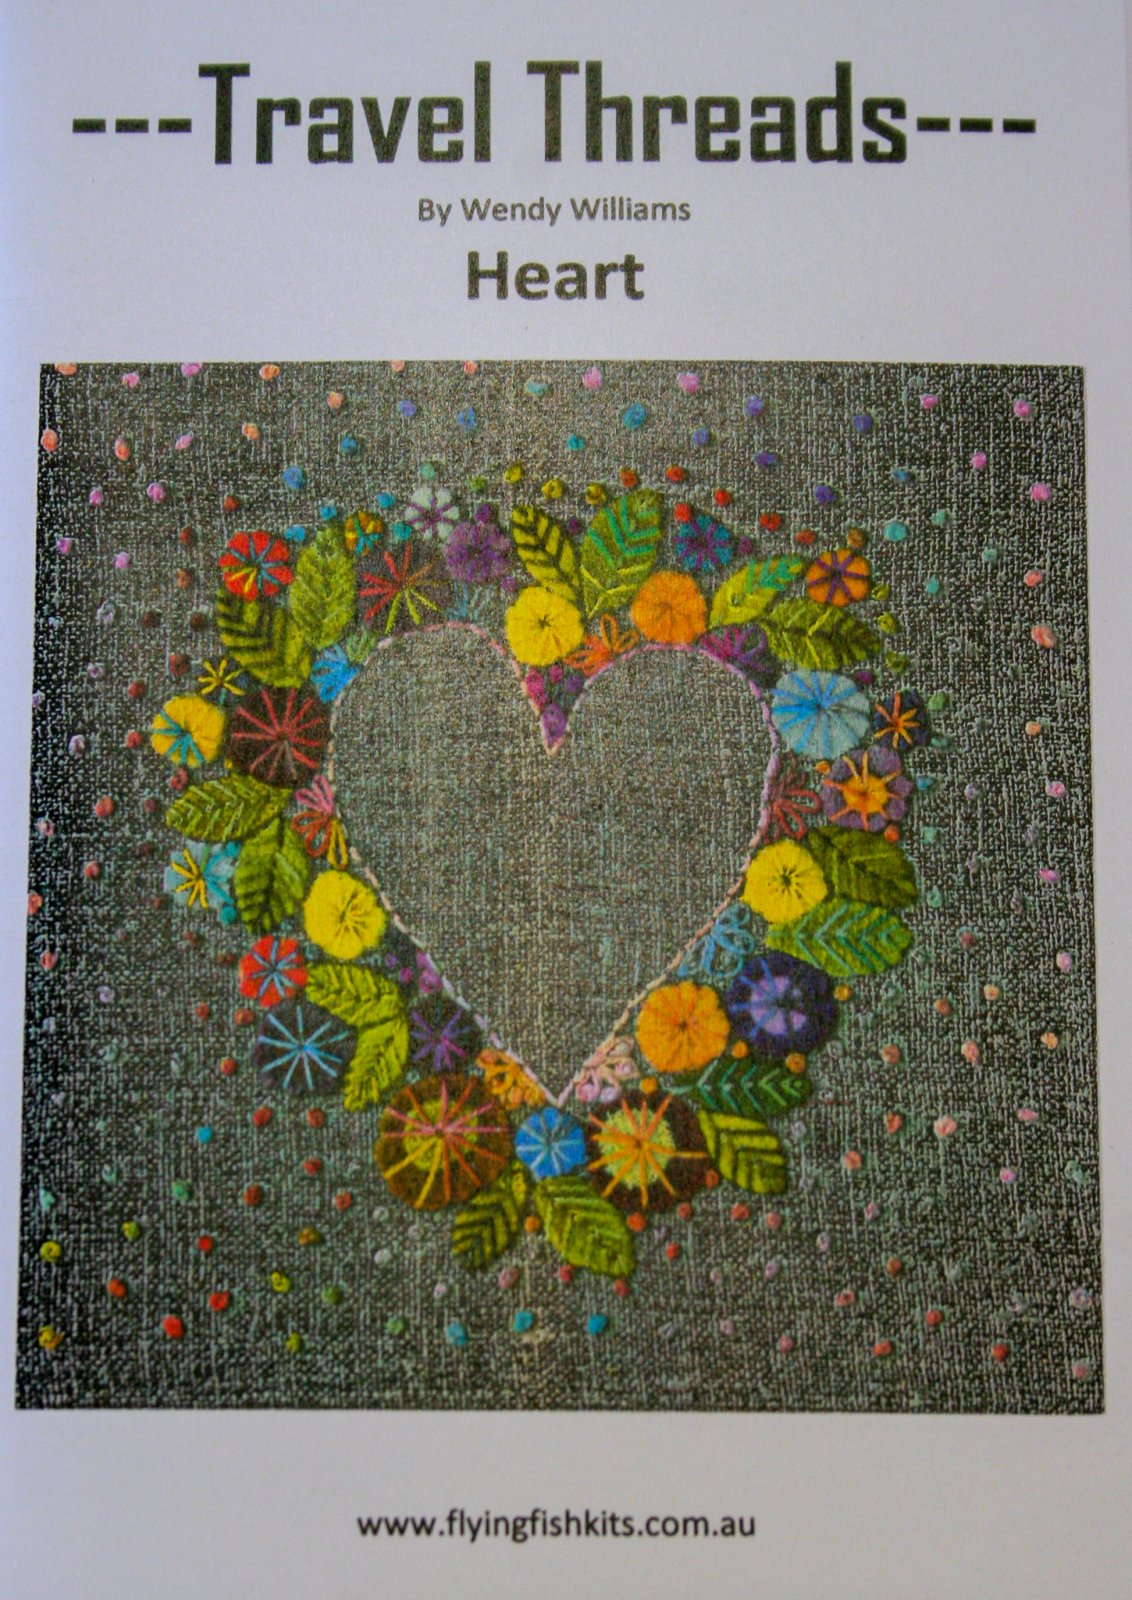 Wendy Williams : Travel Threads - Heart